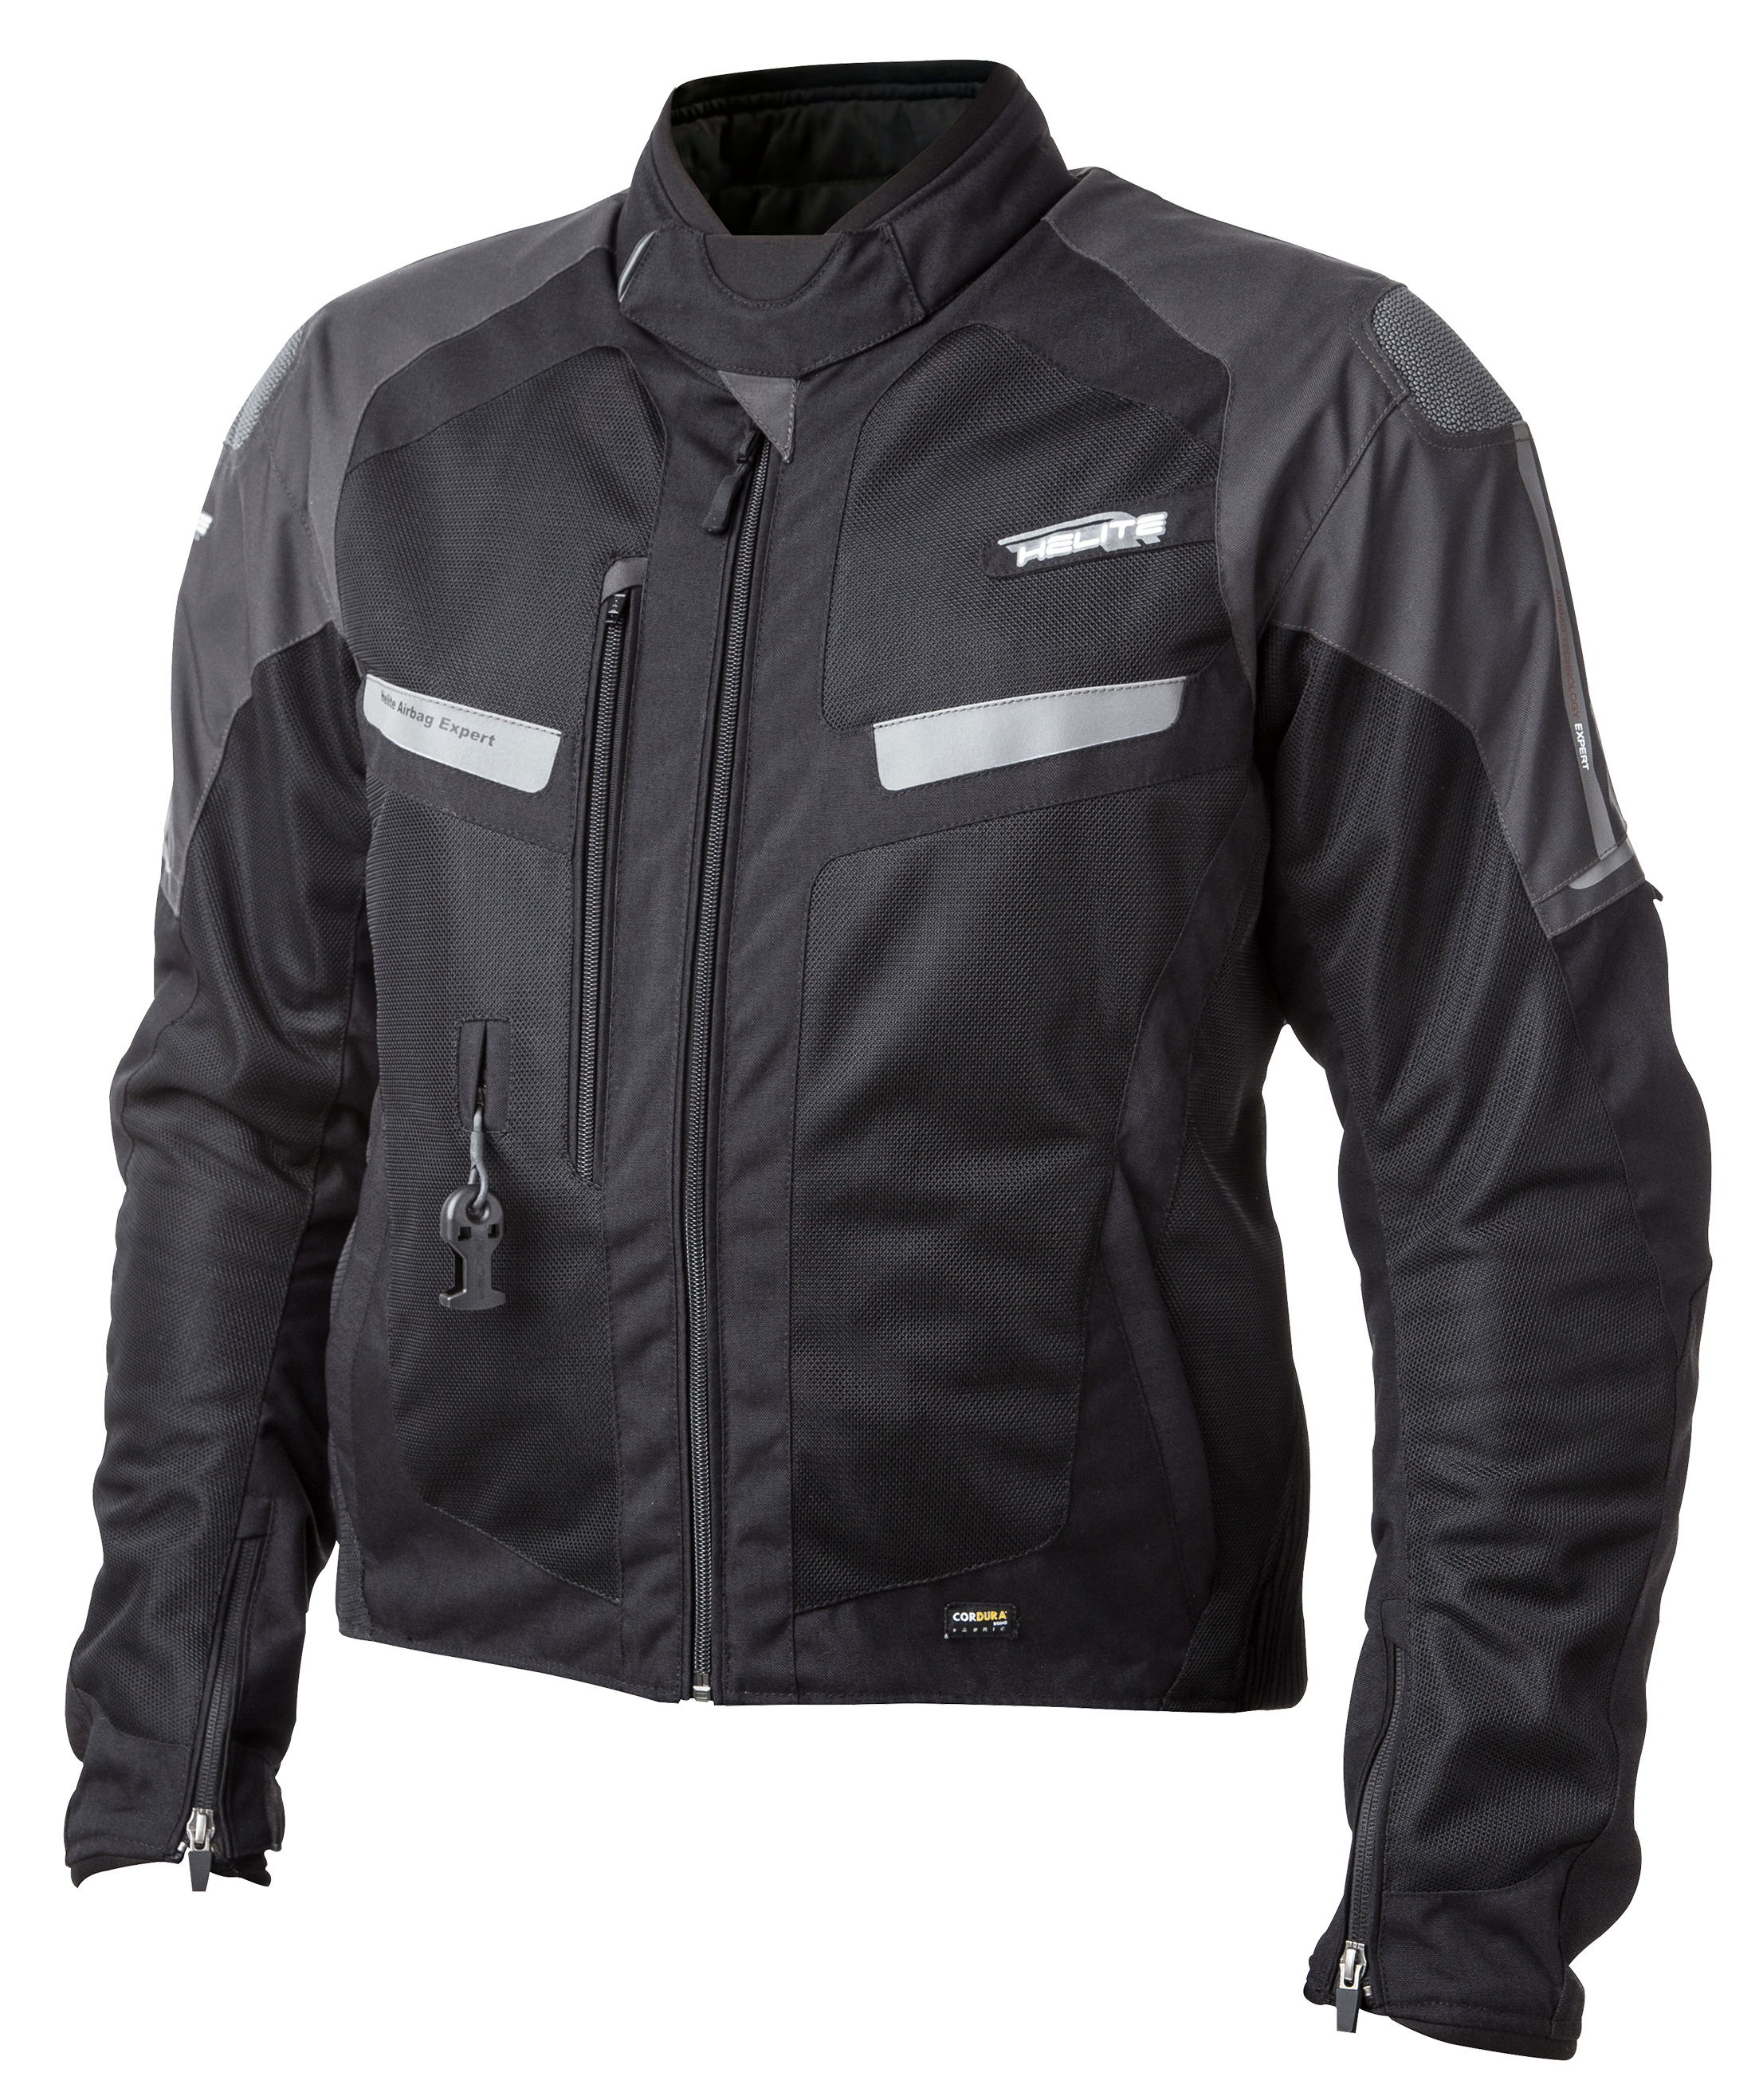 helite motorcycle airbag jackets interesting. Black Bedroom Furniture Sets. Home Design Ideas